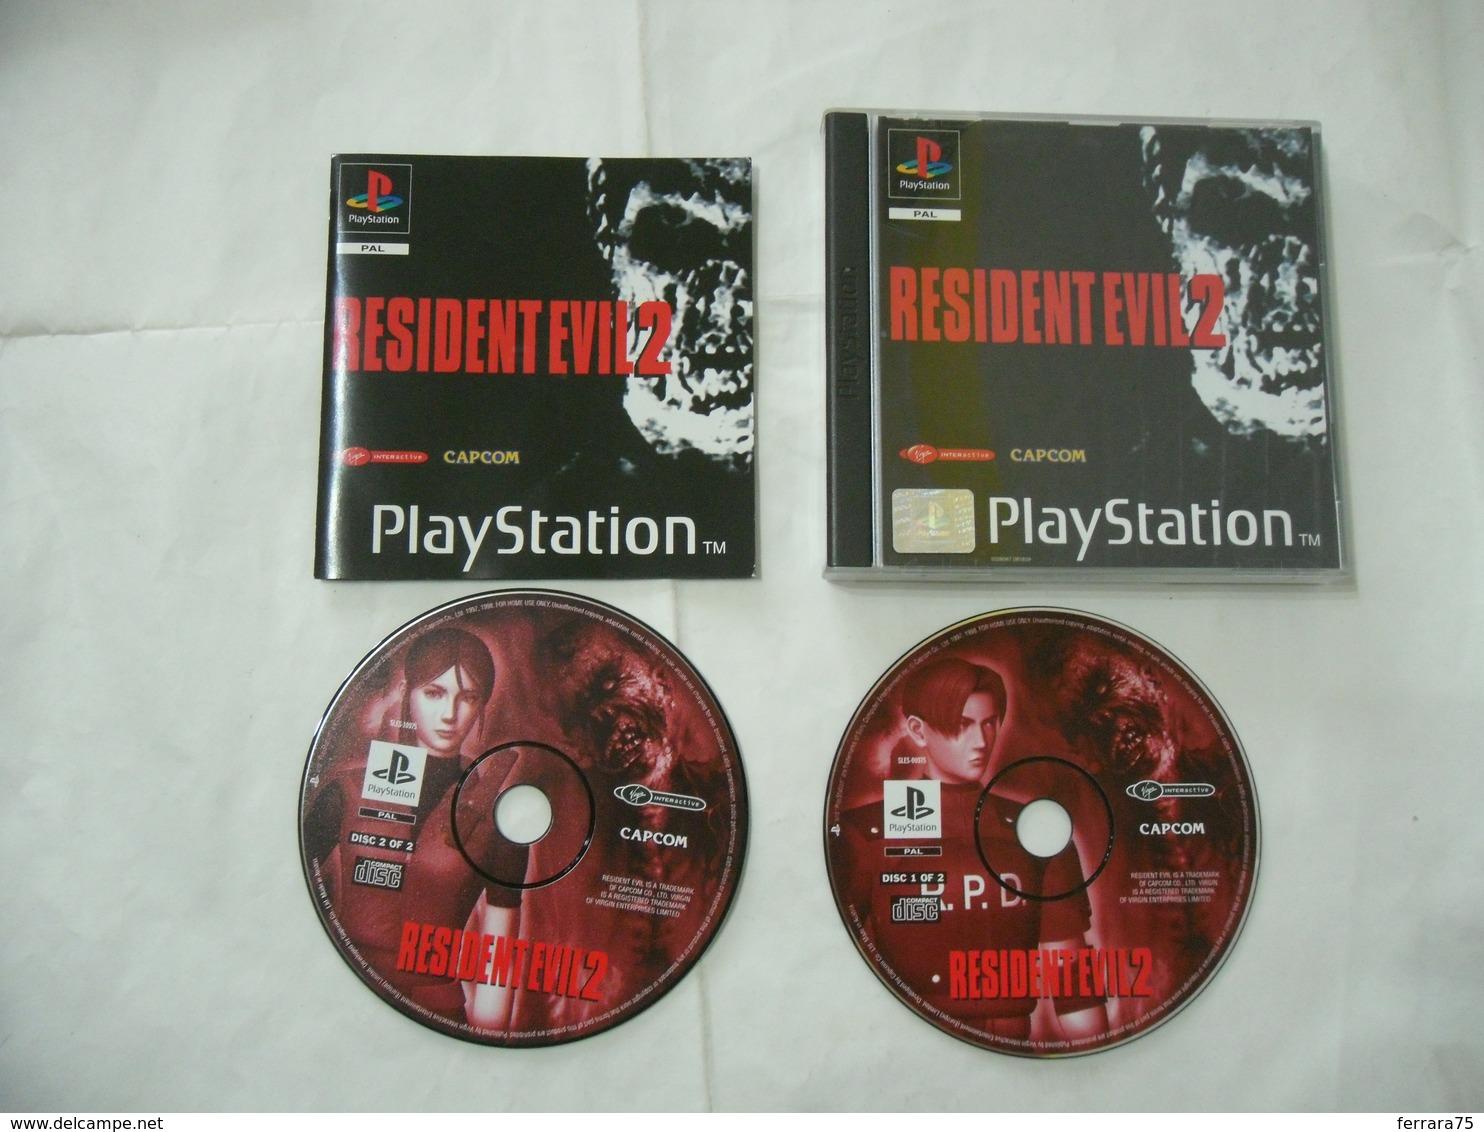 PLAYSTATION 1 PSP1 RESIDENT EVIL 2 ITA - Sony PlayStation